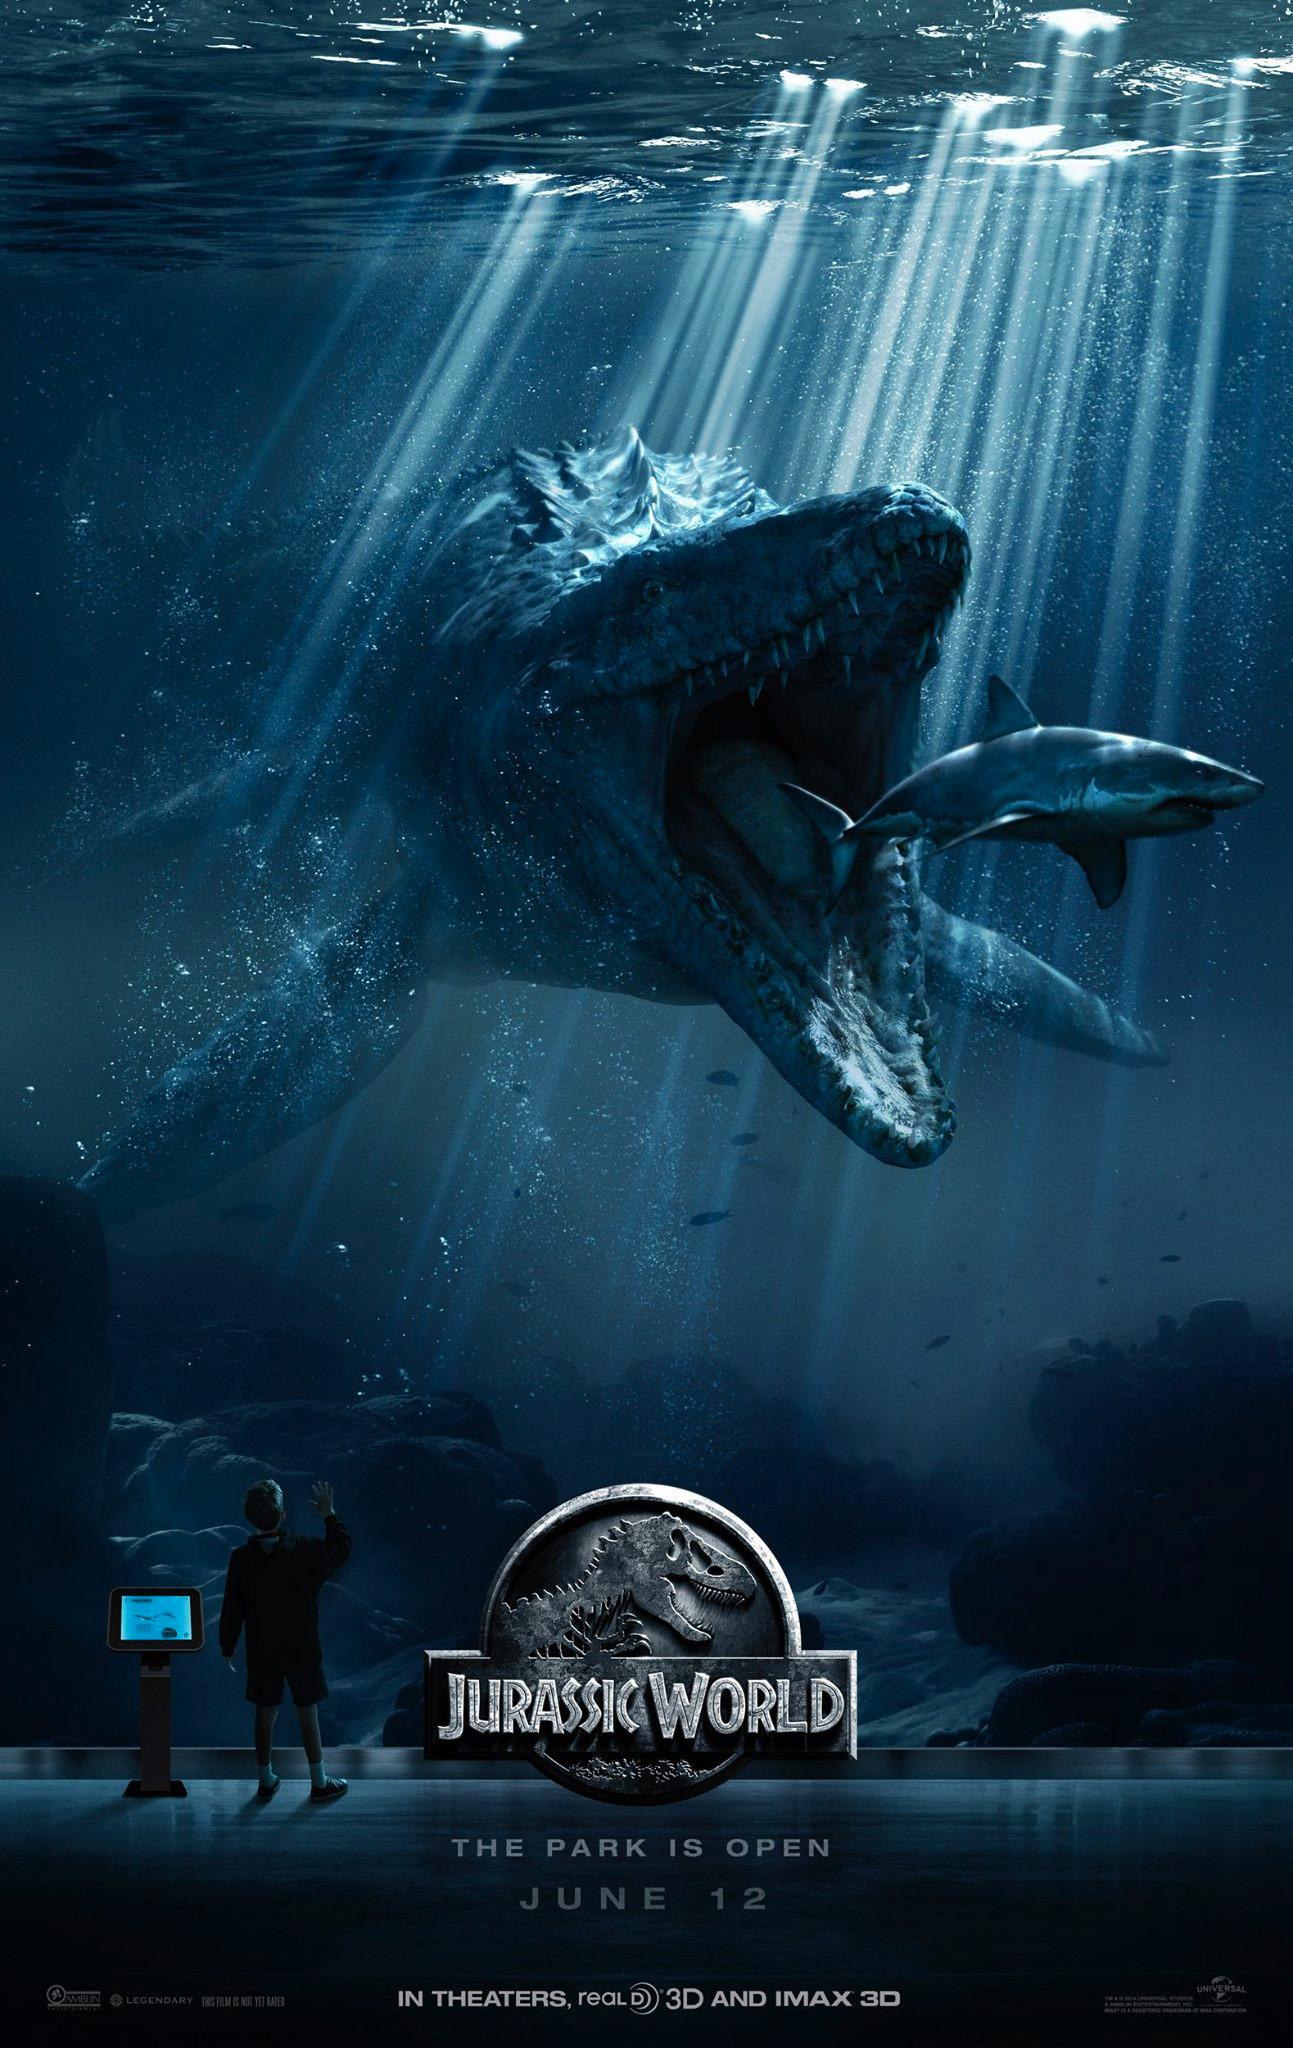 jurassicworldposter2 The Jurassic Park Franchise: What the Hell Happened?